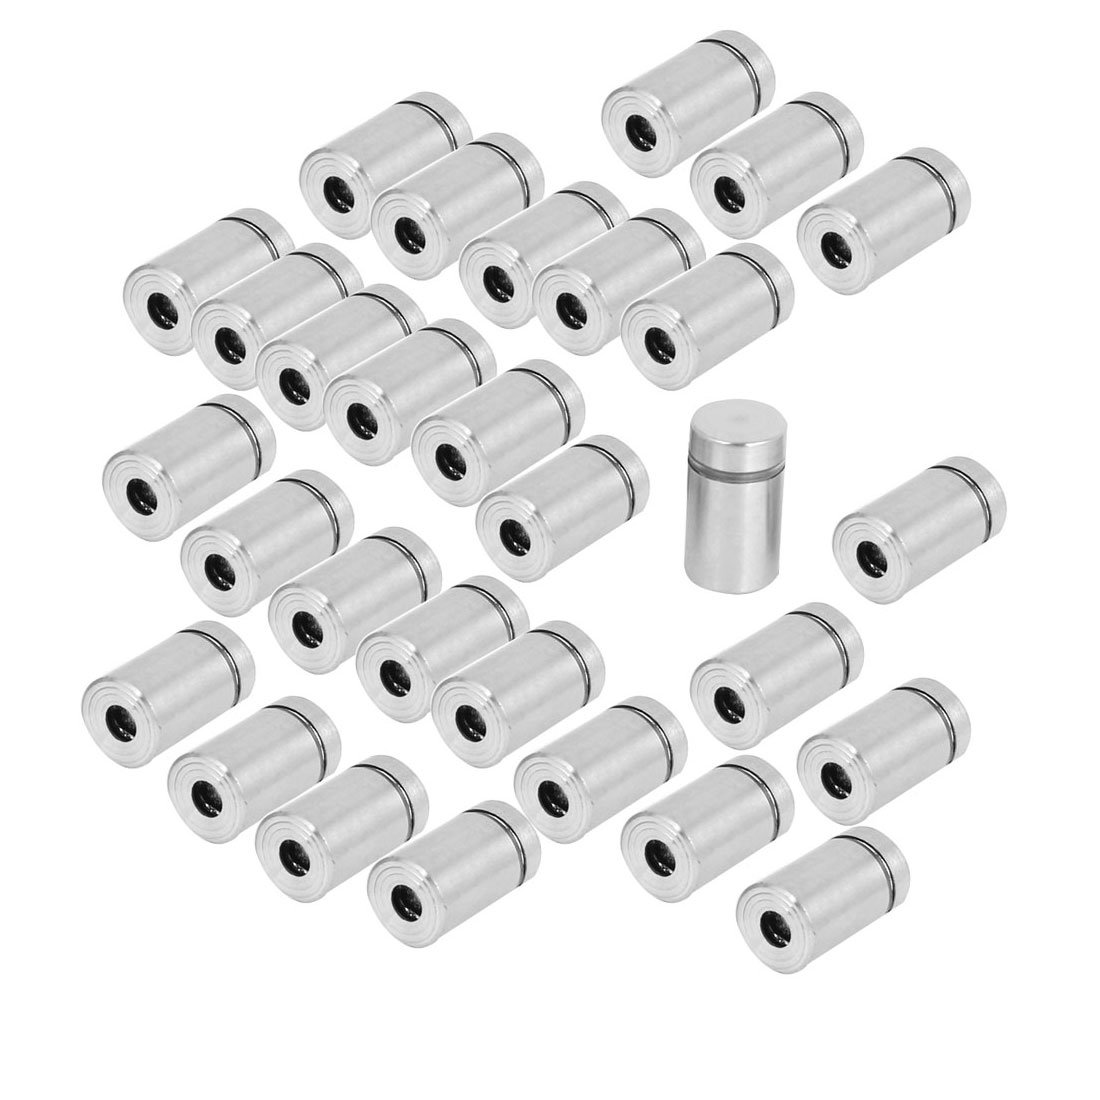 Uxcell a15041500ux0339 Advertisement Fixing Screws Glass Standoff Pins 12mmx20mm Pack of 30